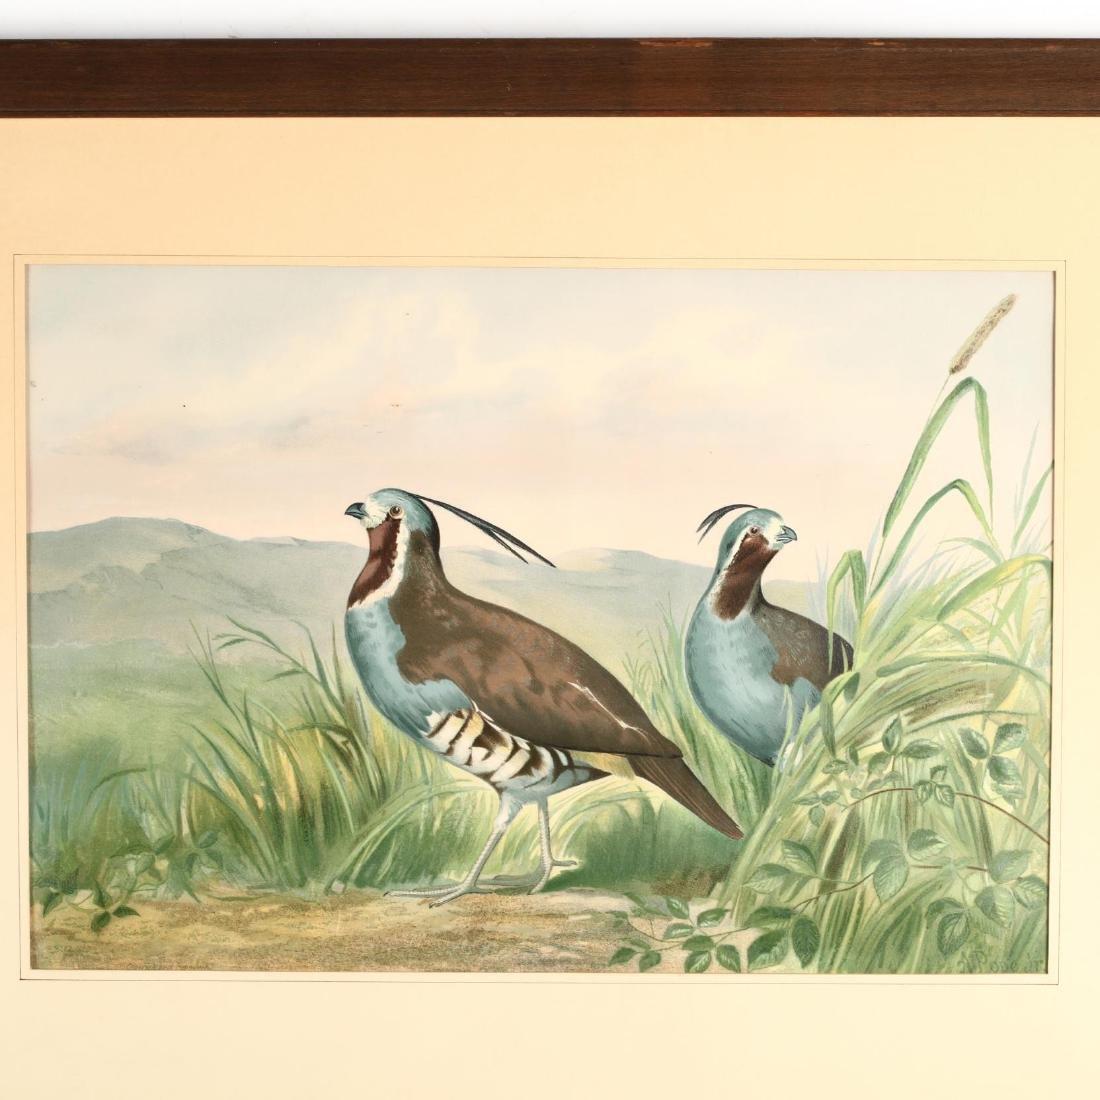 Alexander Pope Jr. (American, 1849-1924), Four Works - 3